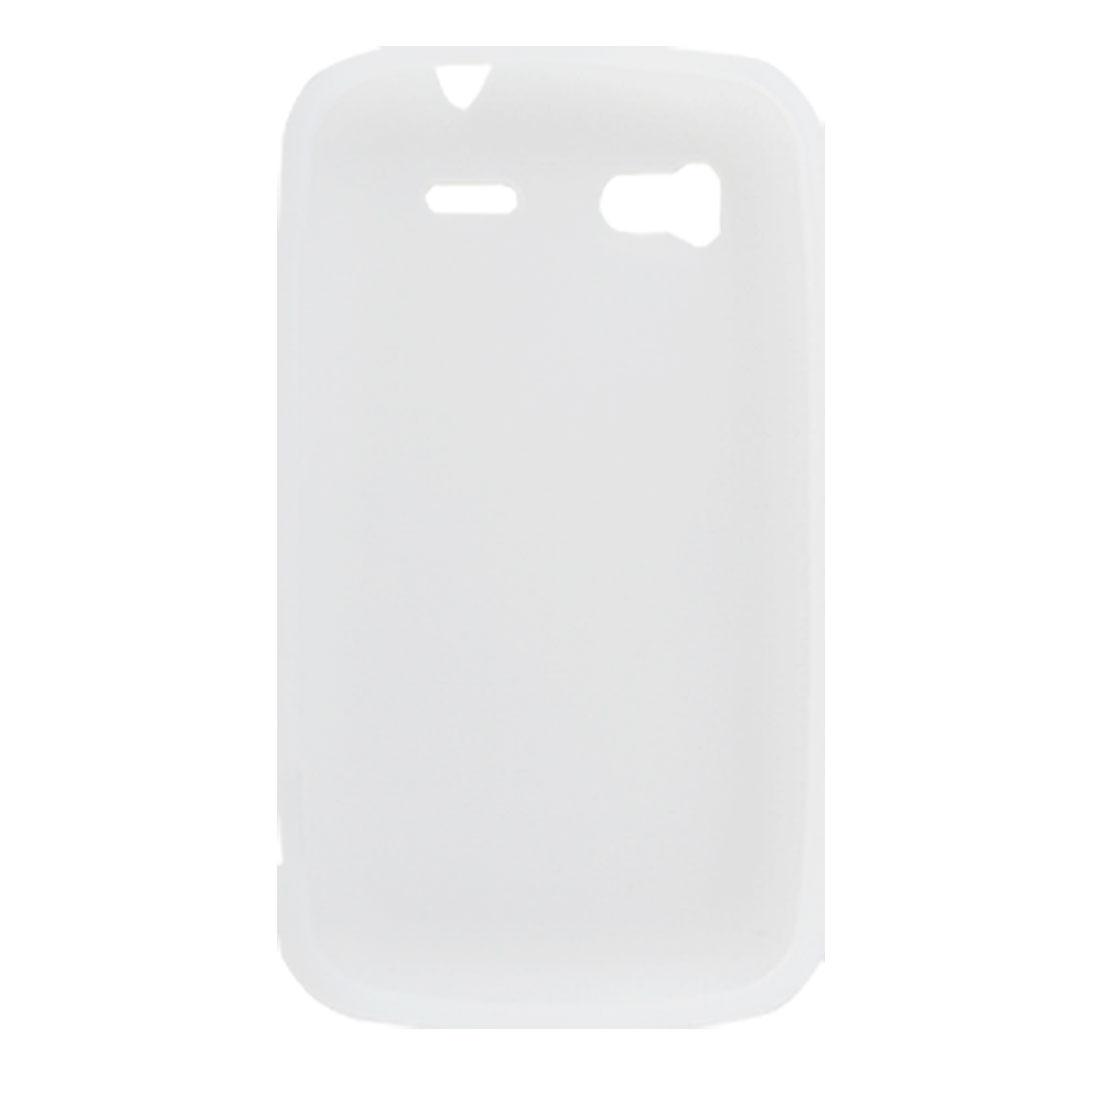 White Silicone Protective Case Cover for HTC Sensation 4G